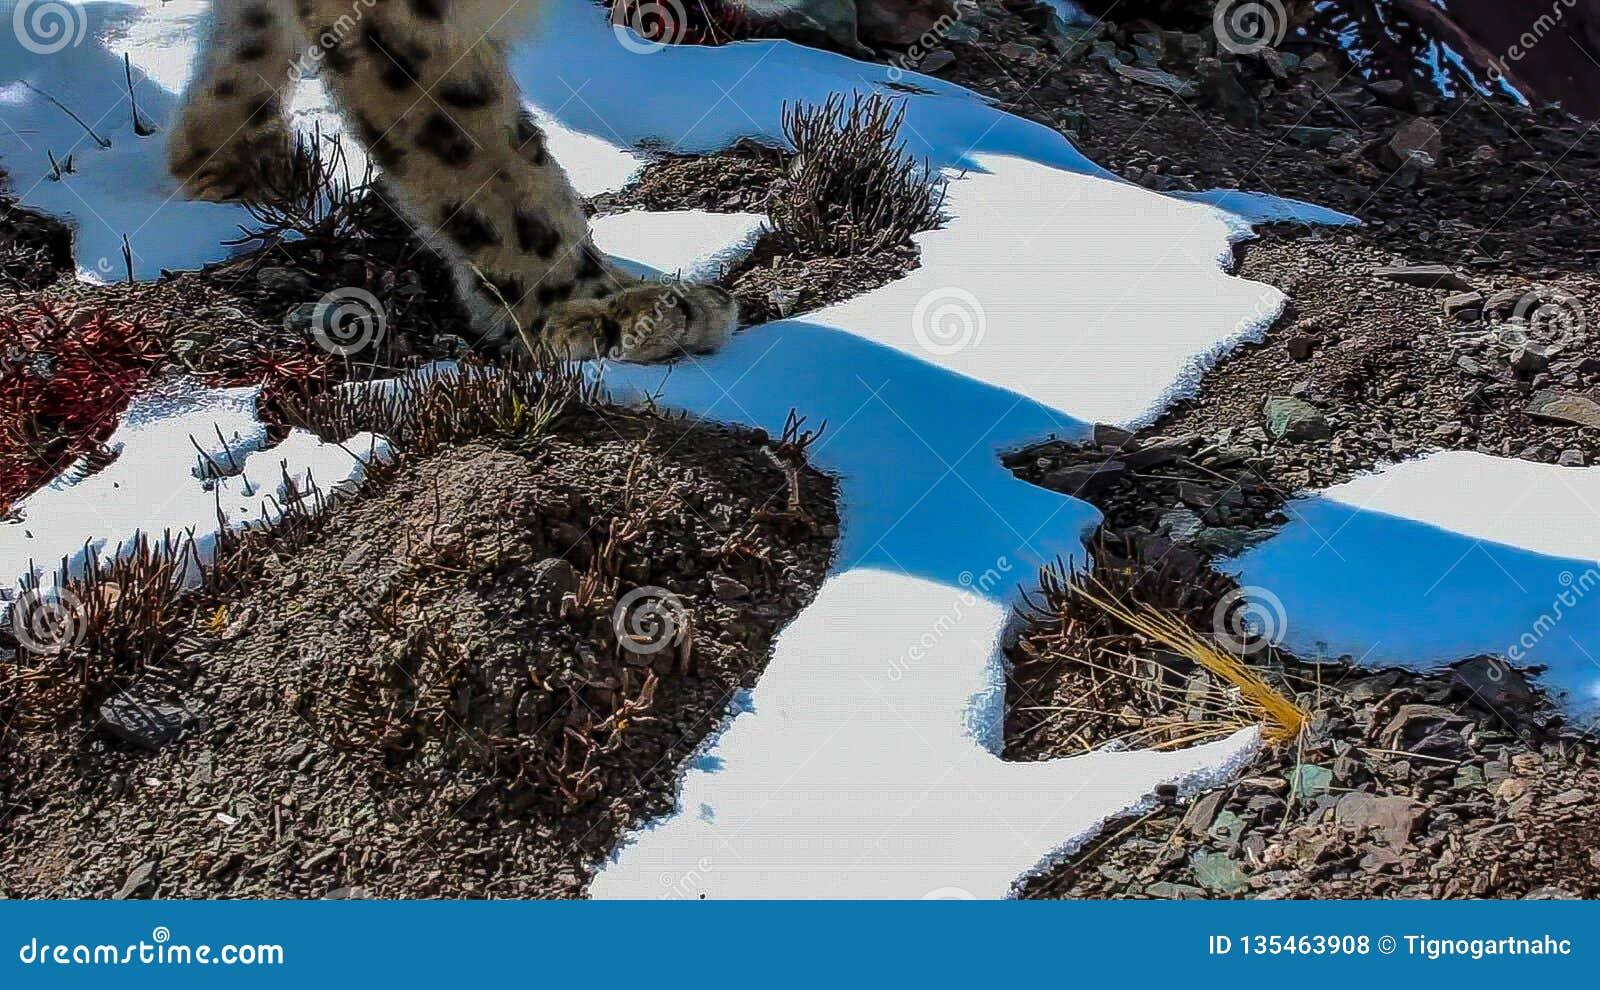 Snow leopard Panthera uncia in winter snow scene